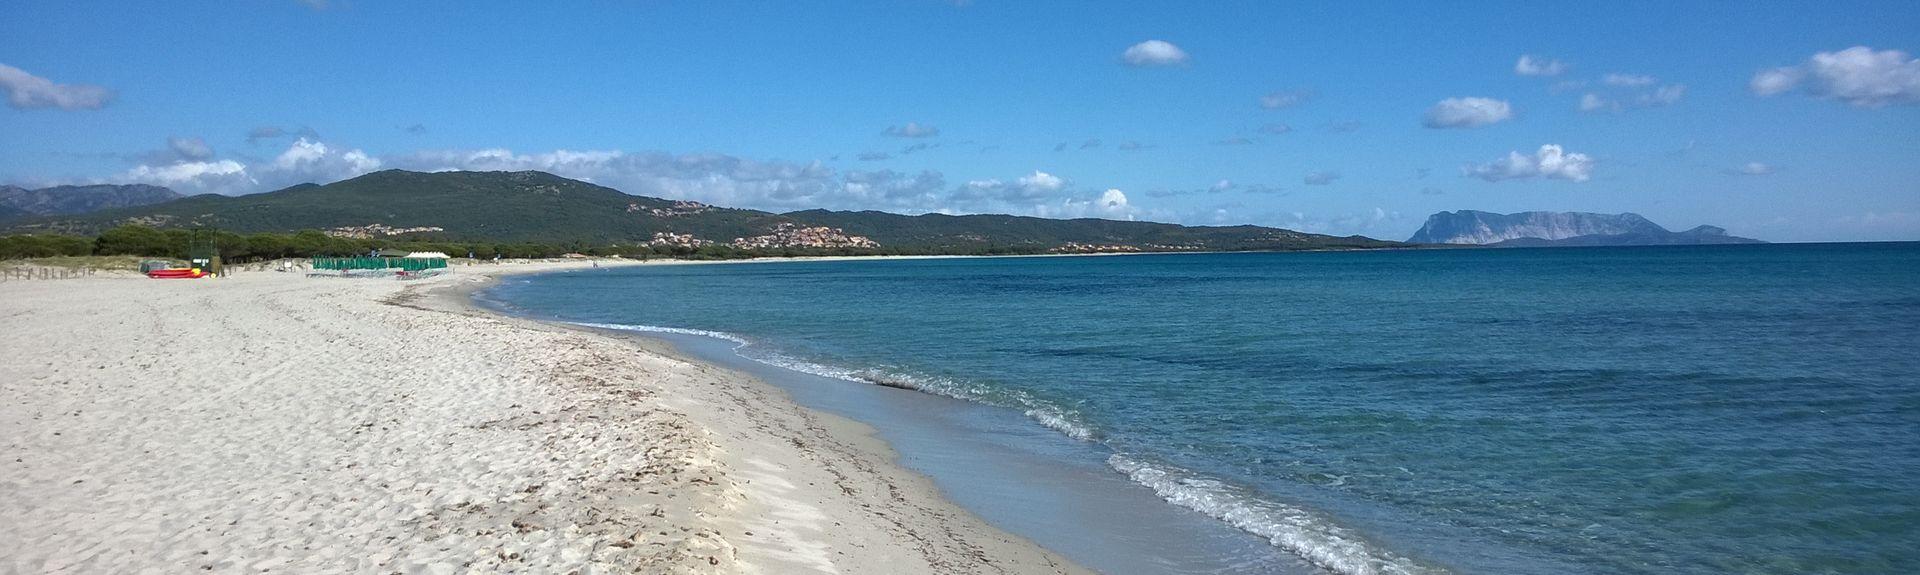 Strand Cala Brandinchi, San Teodoro, Sardinien, Italien